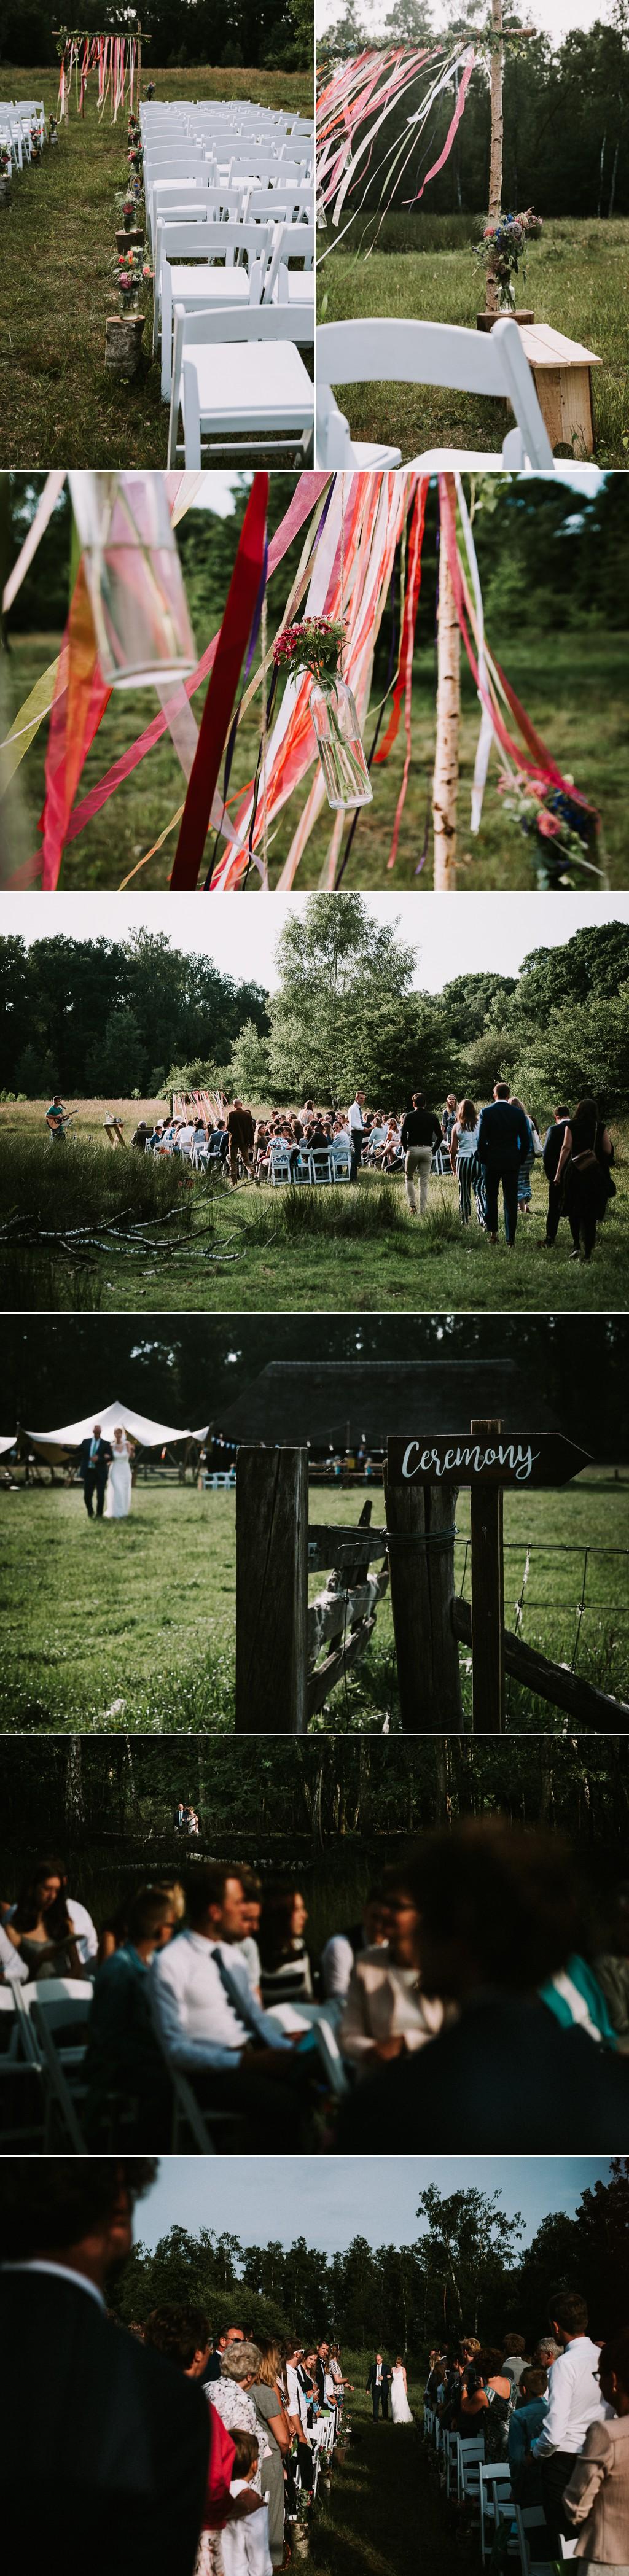 trouwfotograaf-rotterdam-trouwen-in-het-bos-arnhem-fotografie-steef-utama-w-w-10